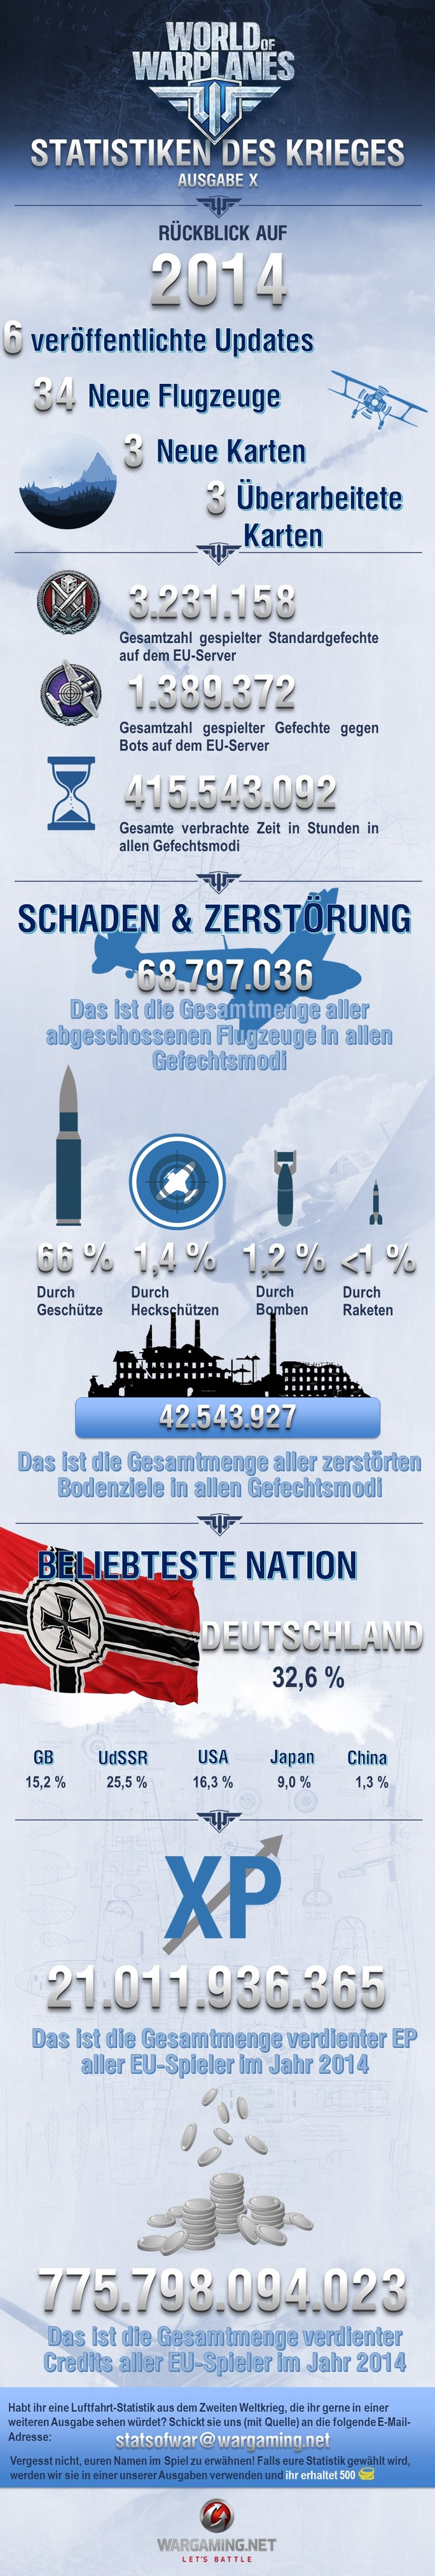 world_of_warplanes_statistik_2014